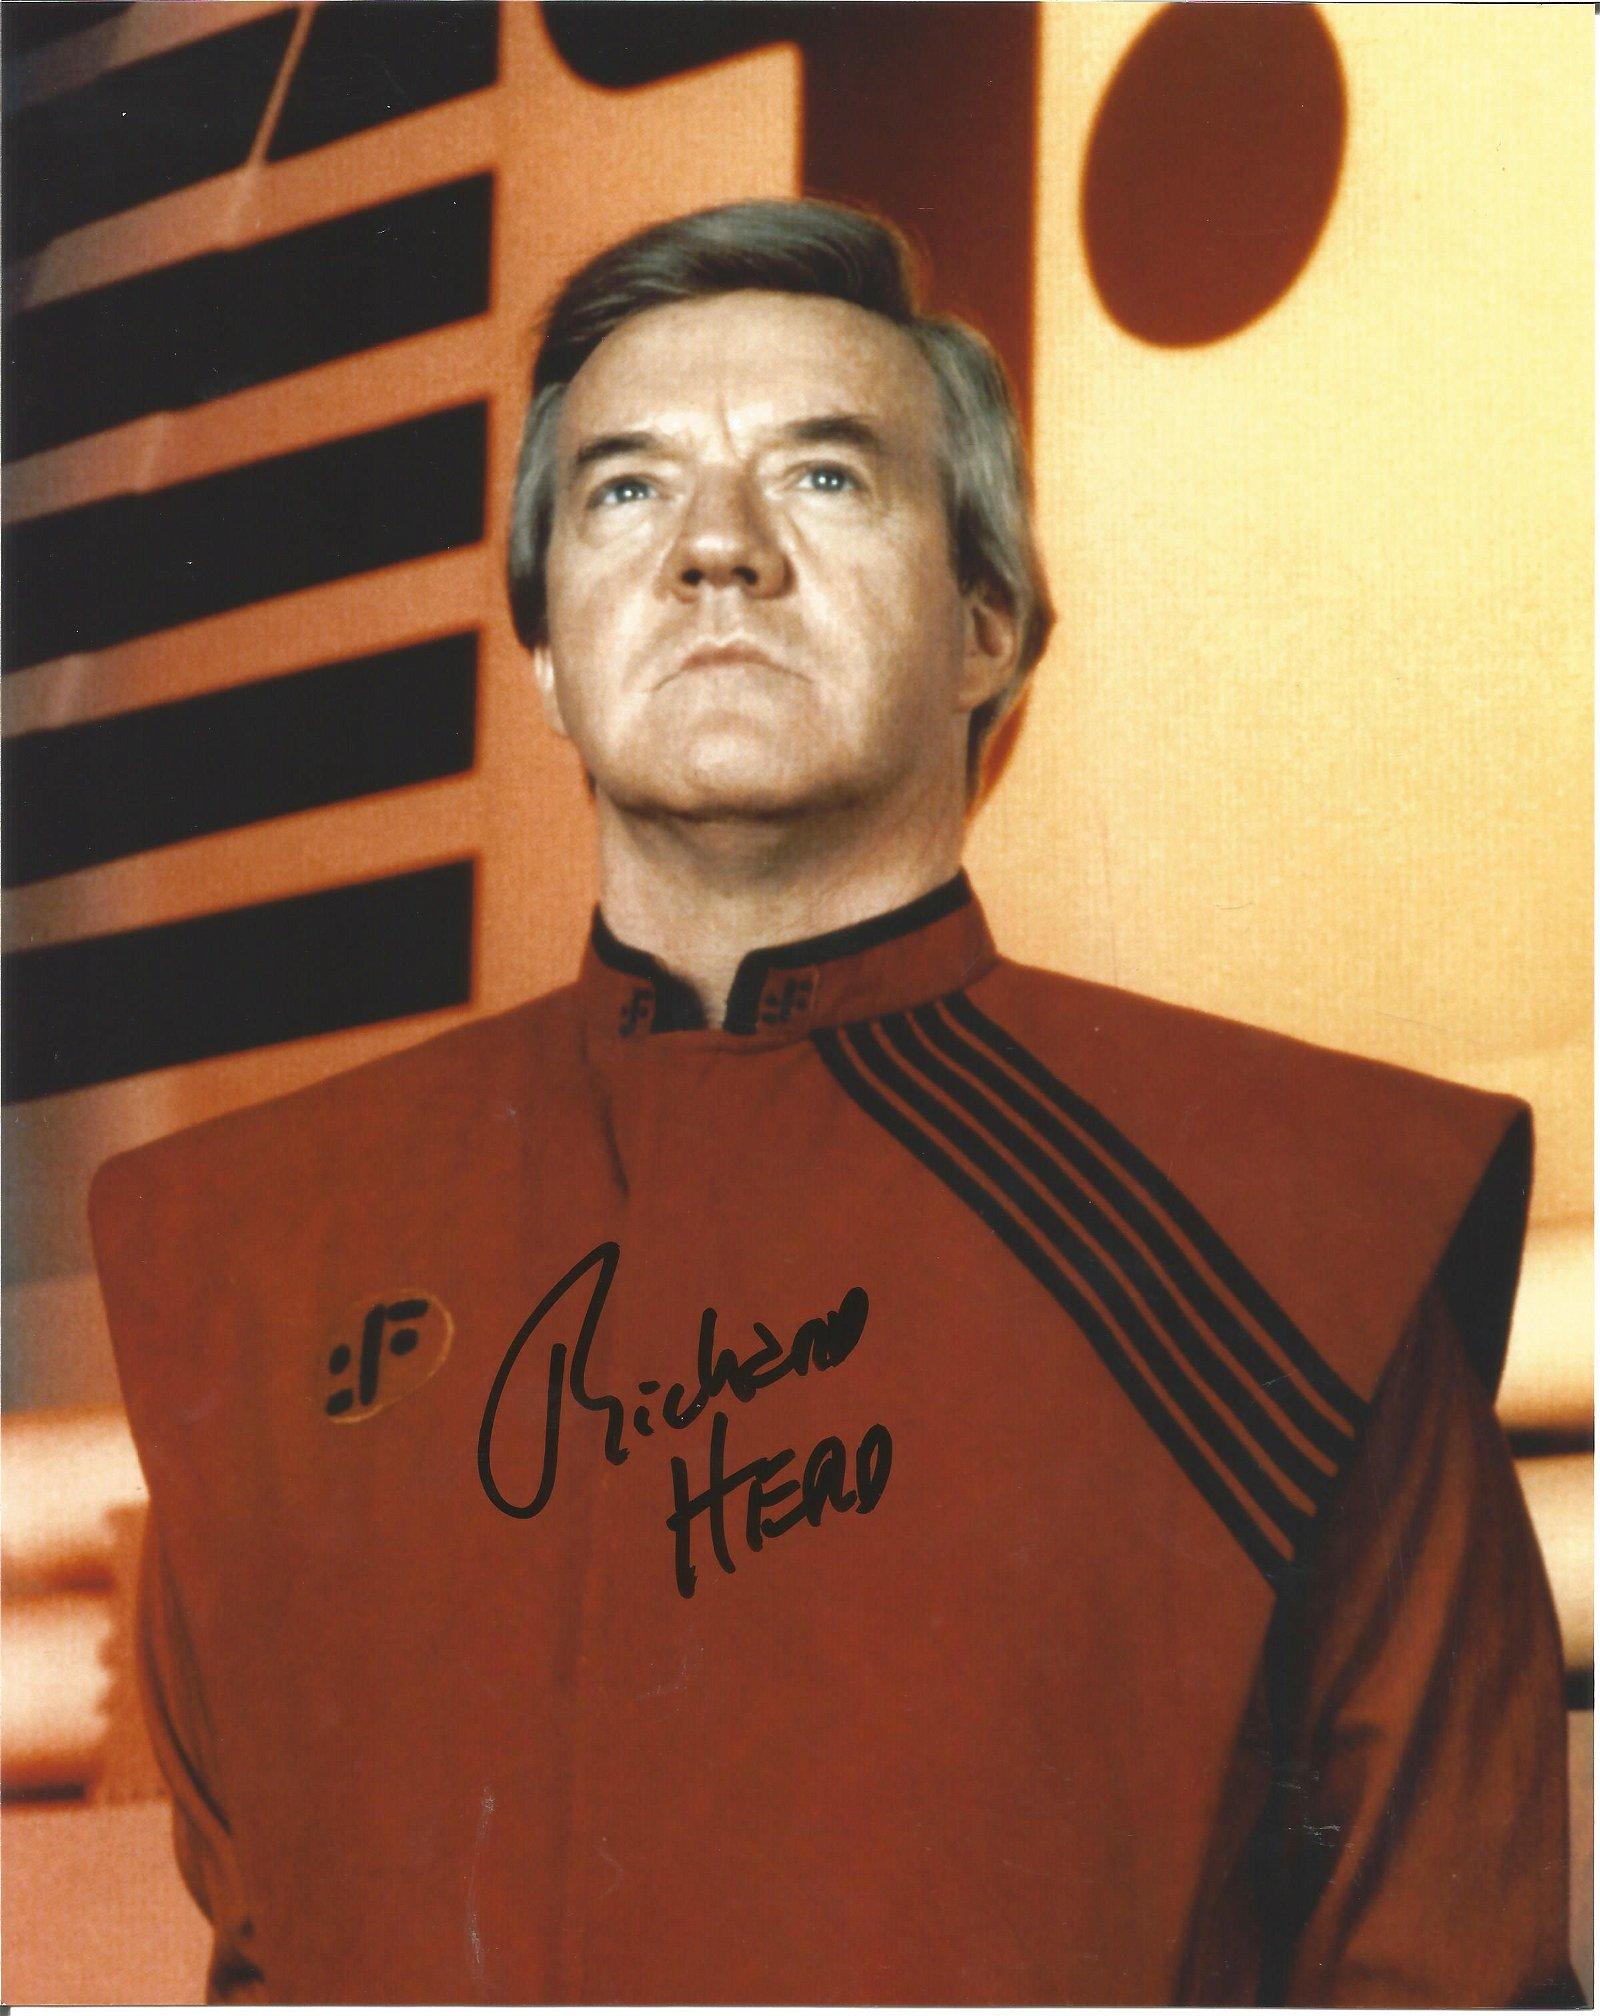 Richard Herd Star Trek etc signed authentic 10x8 colour